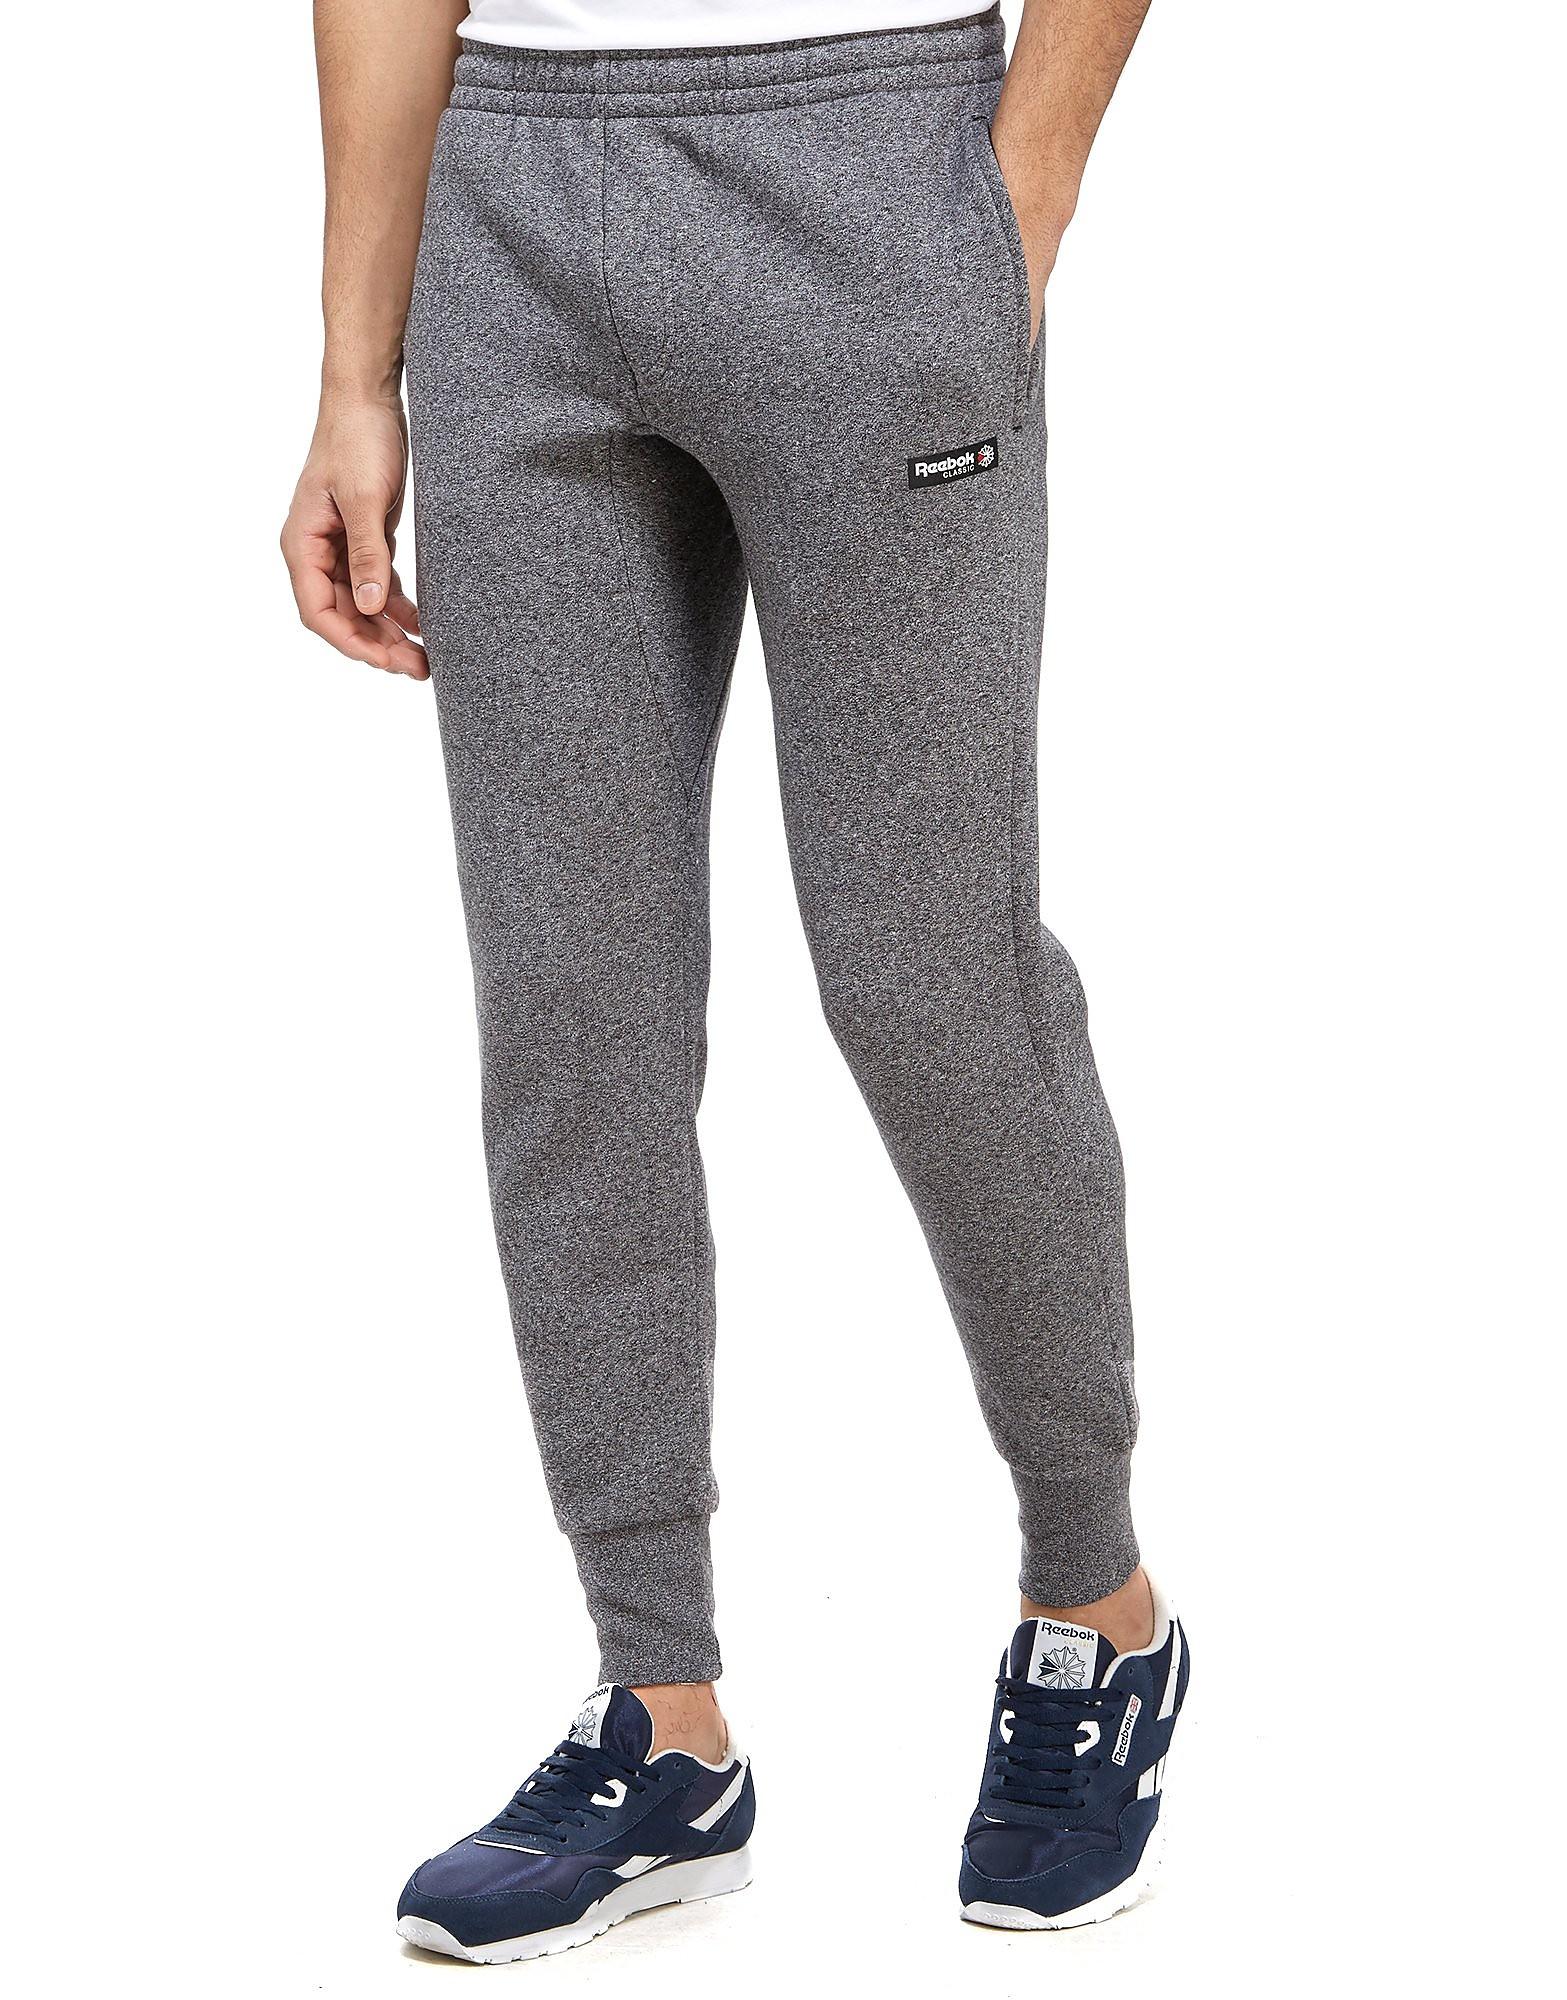 Reebok Classic Cuff Pants